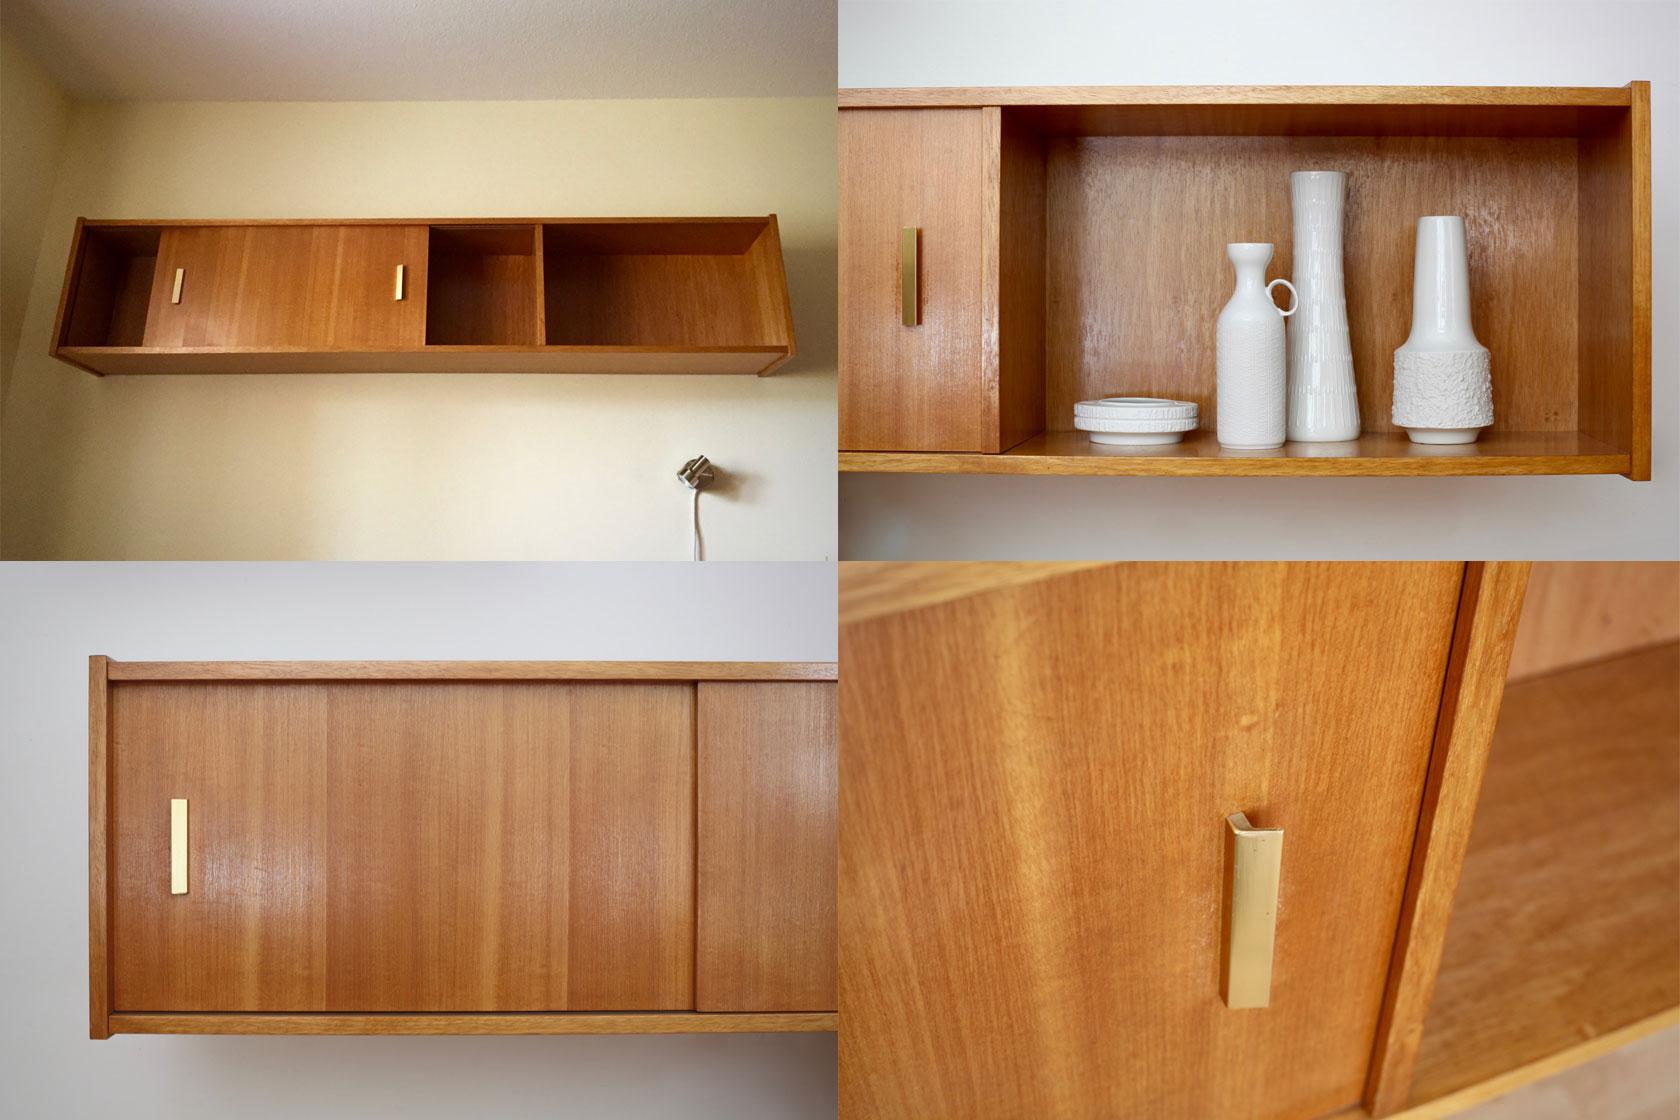 gro es wandregal mit schiebet ren raumwunder vintage. Black Bedroom Furniture Sets. Home Design Ideas